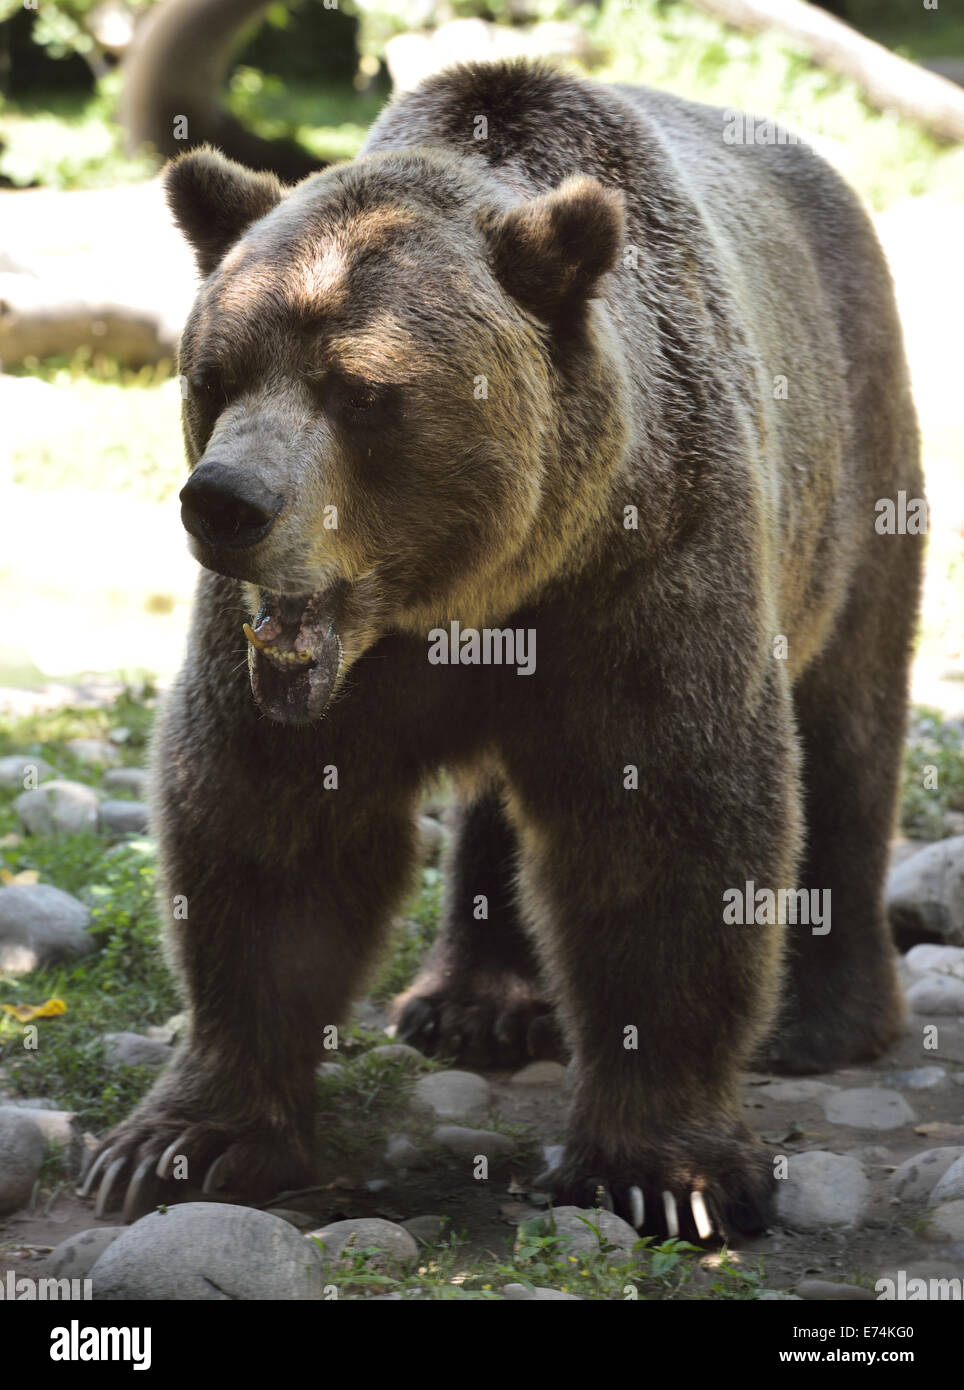 Grimacing face of mature Grizzly bear Ursus arctos horribilis Toronto Zoo - Stock Image